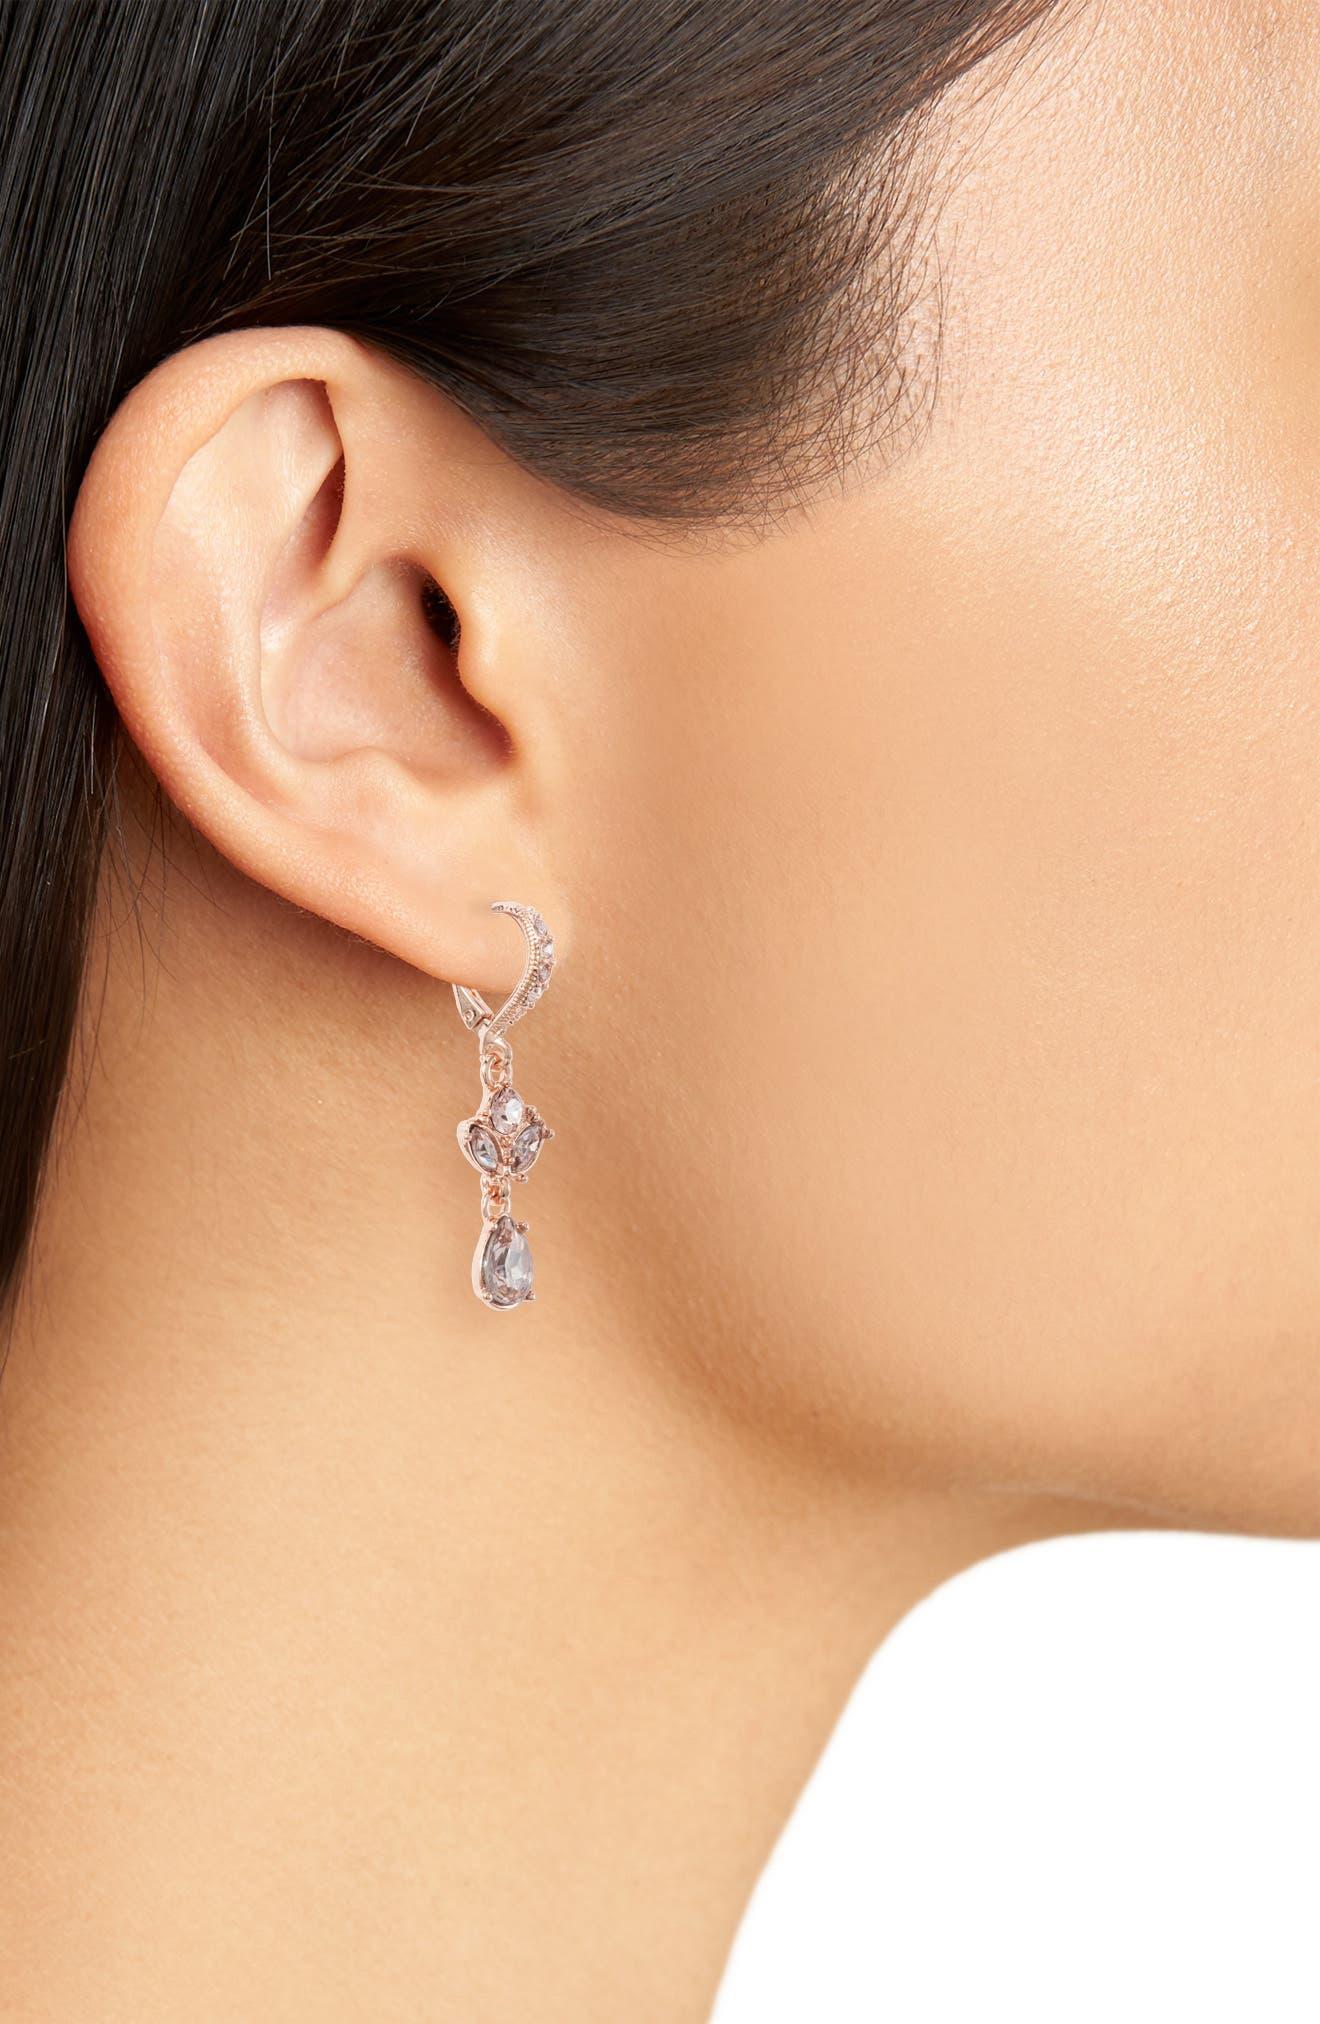 Small Crystal Drop Earrings,                             Alternate thumbnail 2, color,                             650